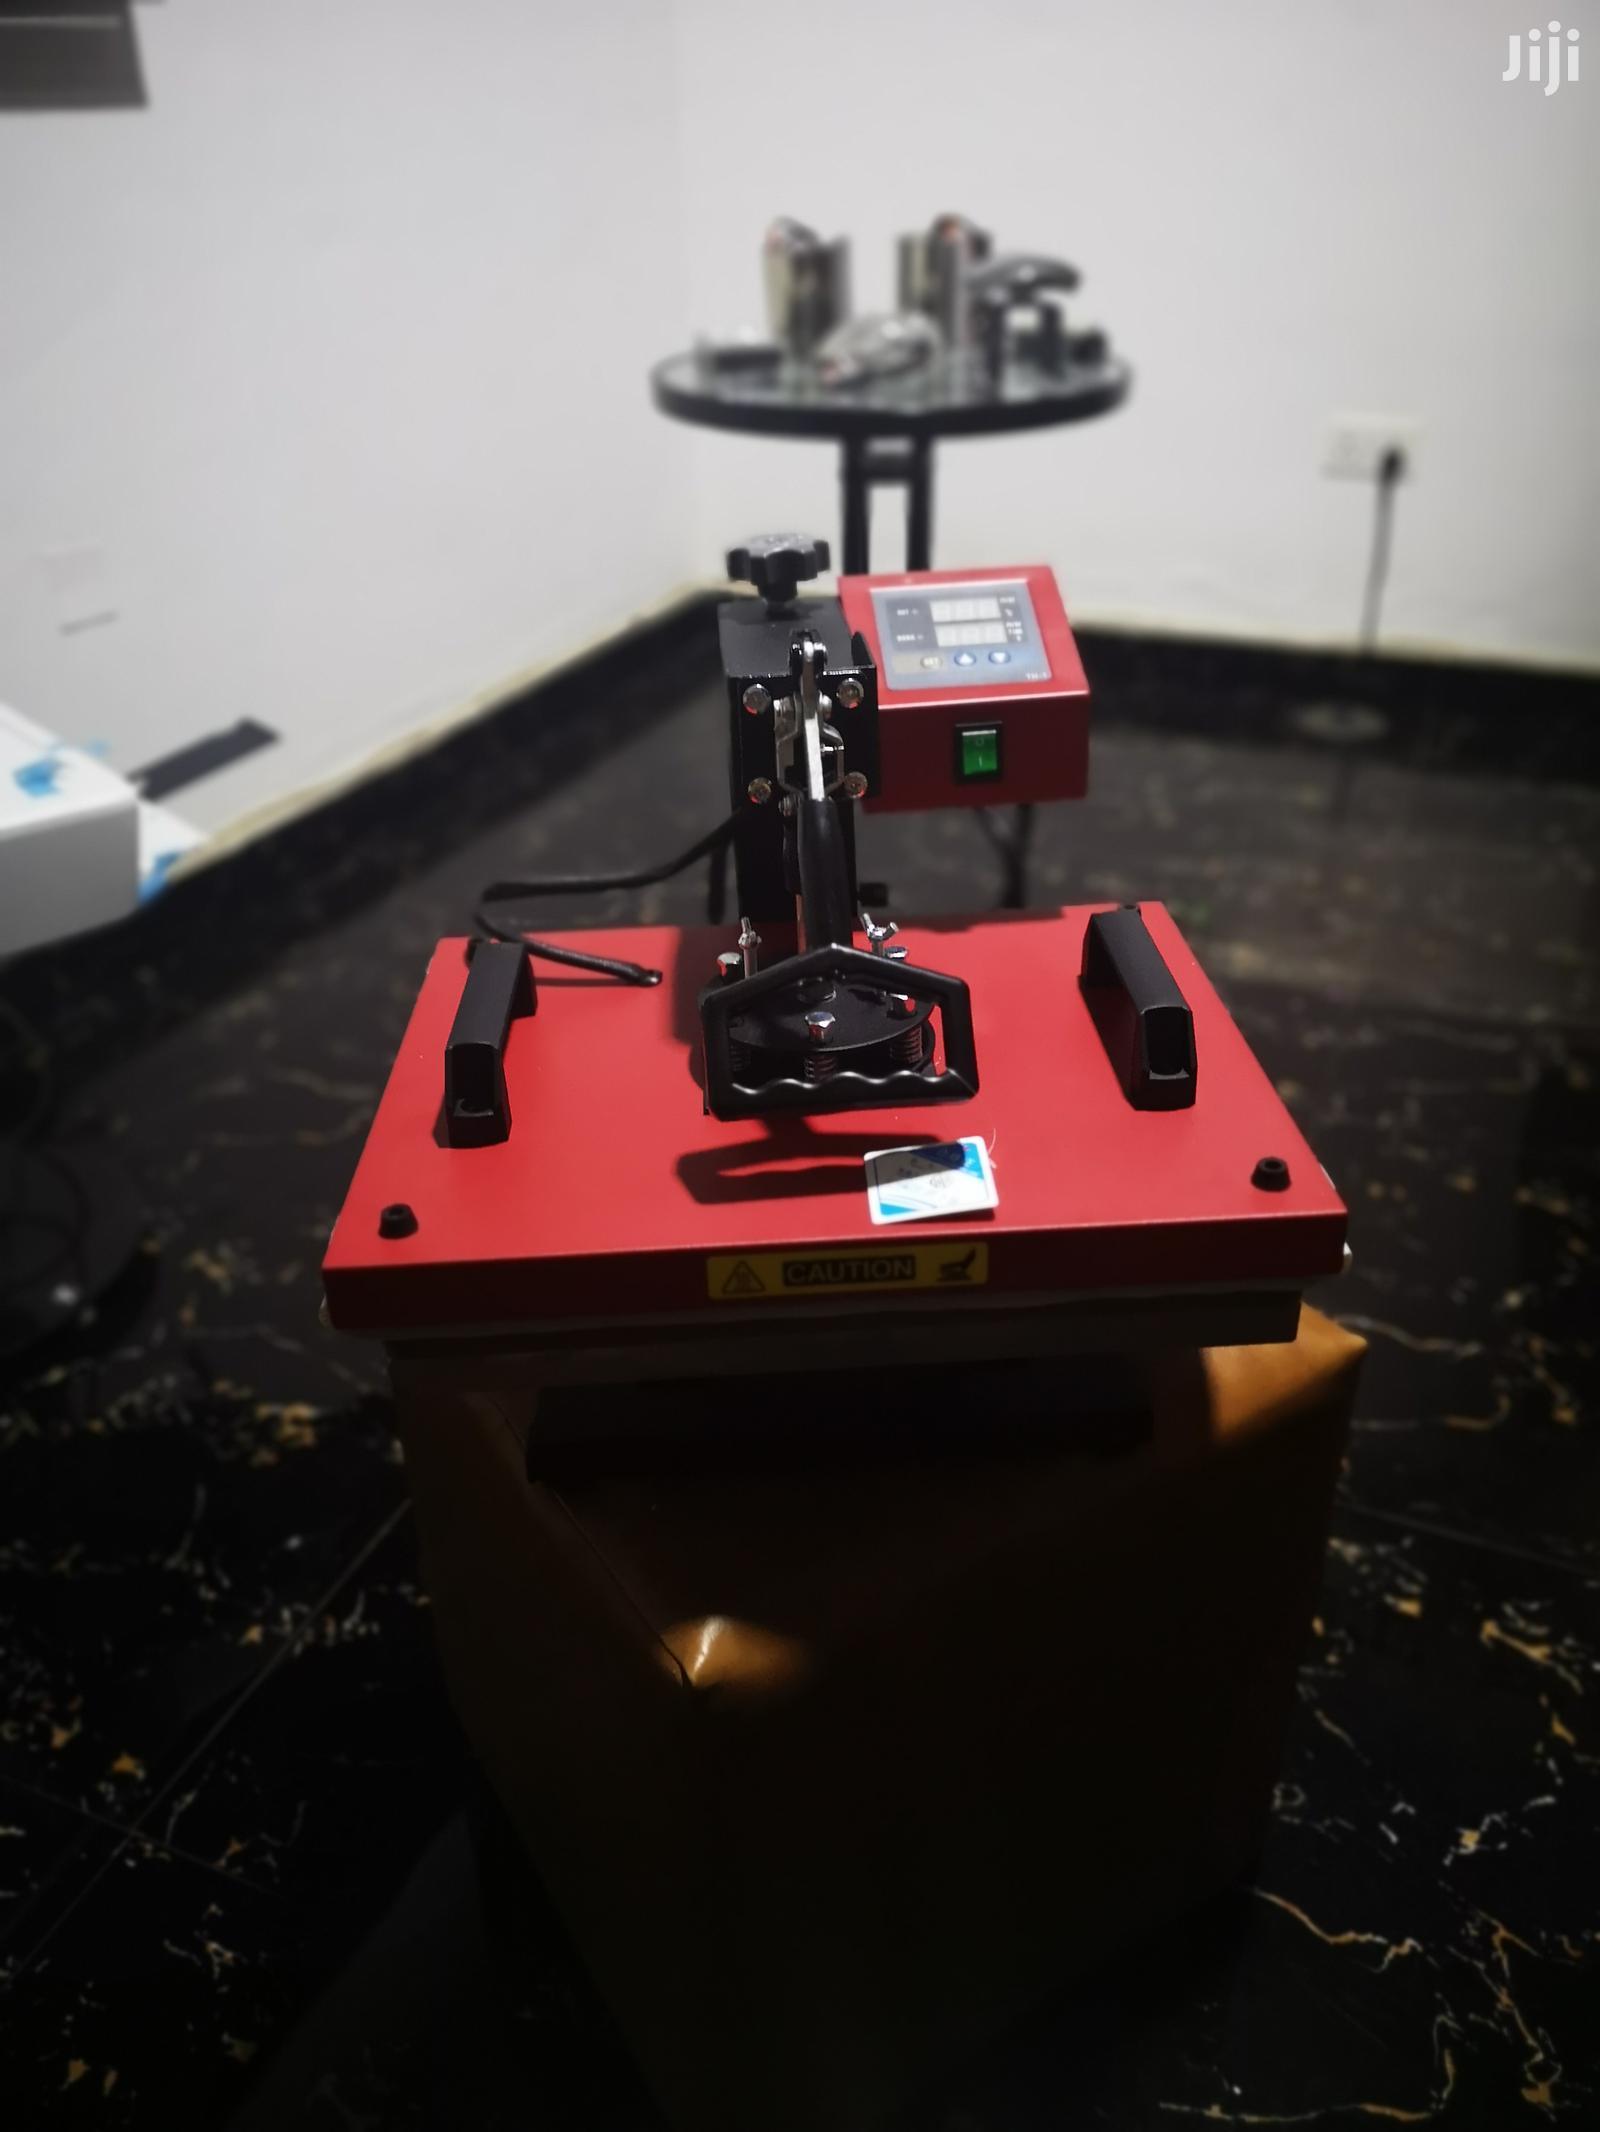 QUALITY BRAND NEW 6 In 1 Heat Press Machines